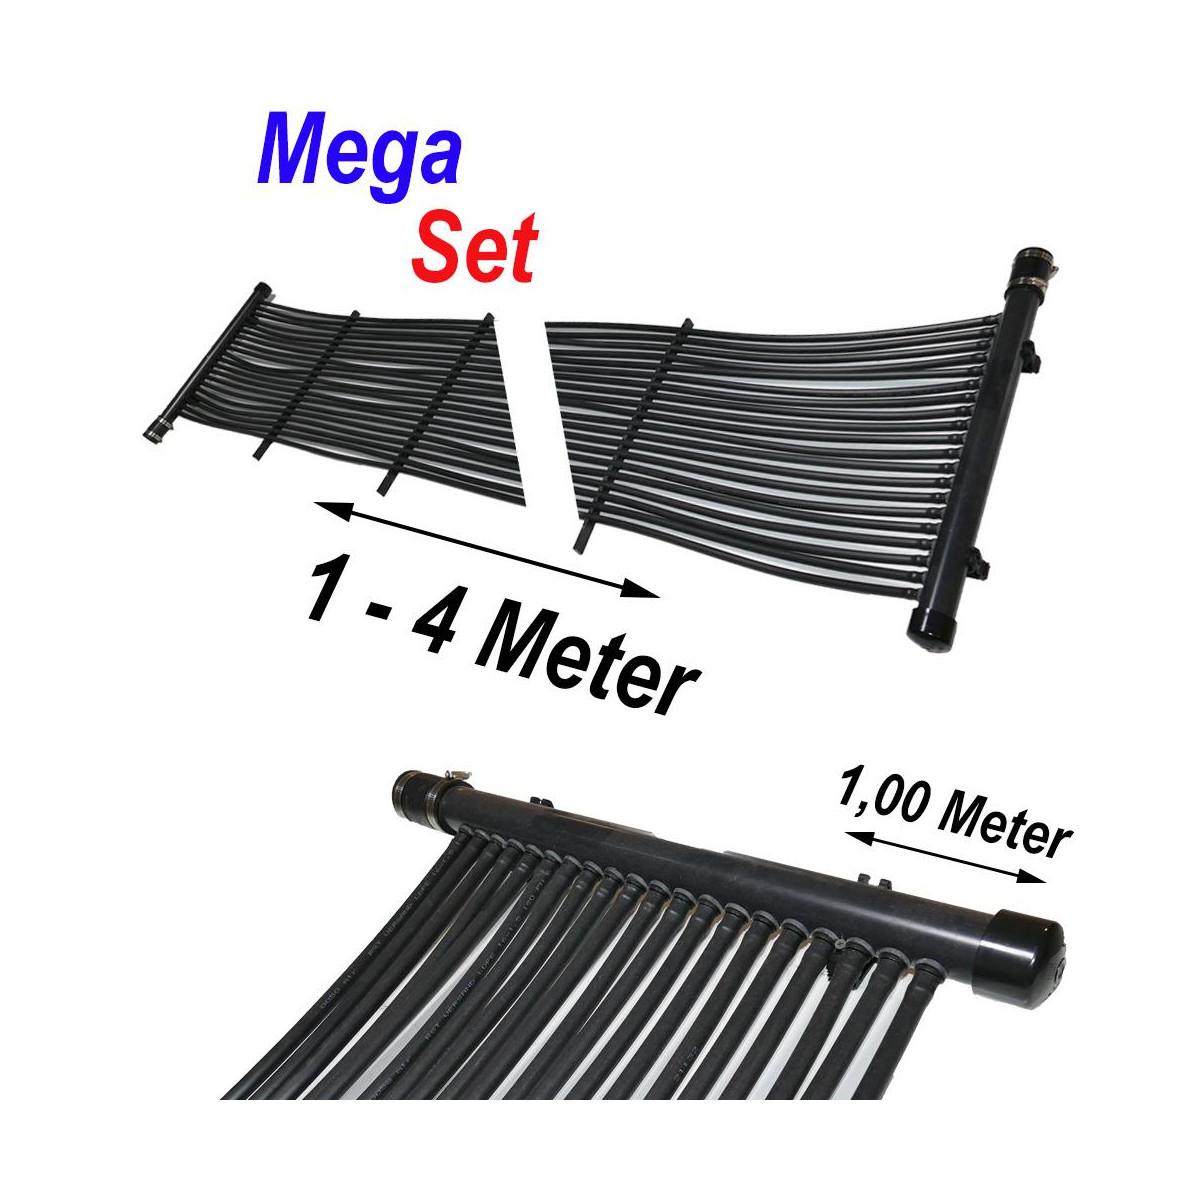 RST-VERSAND (Eigenmarke) Poolheizung Solarmatte MegaSet 3,60 m² (120 Meter)